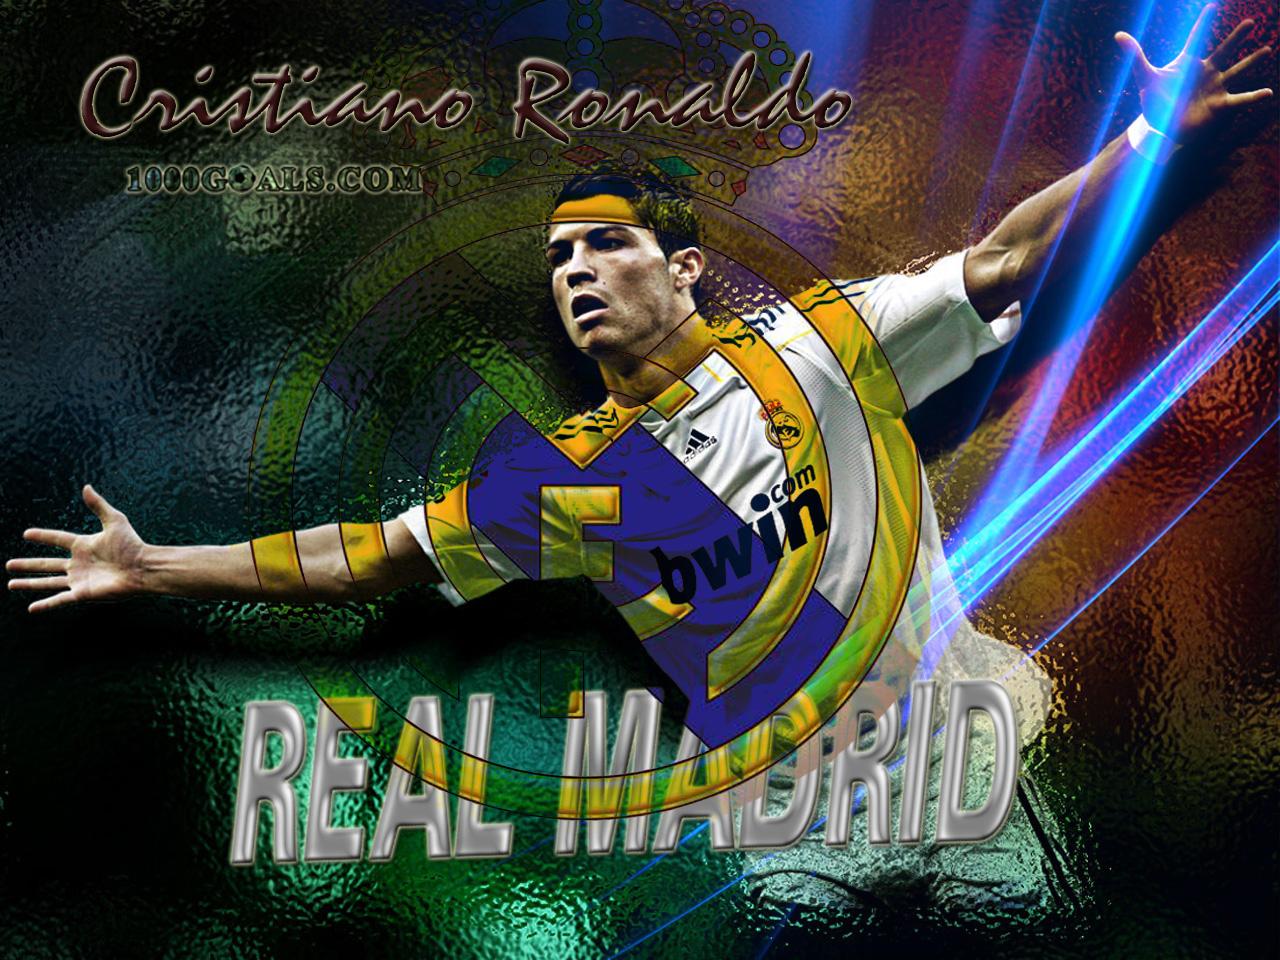 http://3.bp.blogspot.com/_kEMmpKDMznY/TRjbKWtxEMI/AAAAAAAAAOw/68ccOEI7VXw/s1600/Cristiano-Ronaldo-Real-Madrid-04.jpg